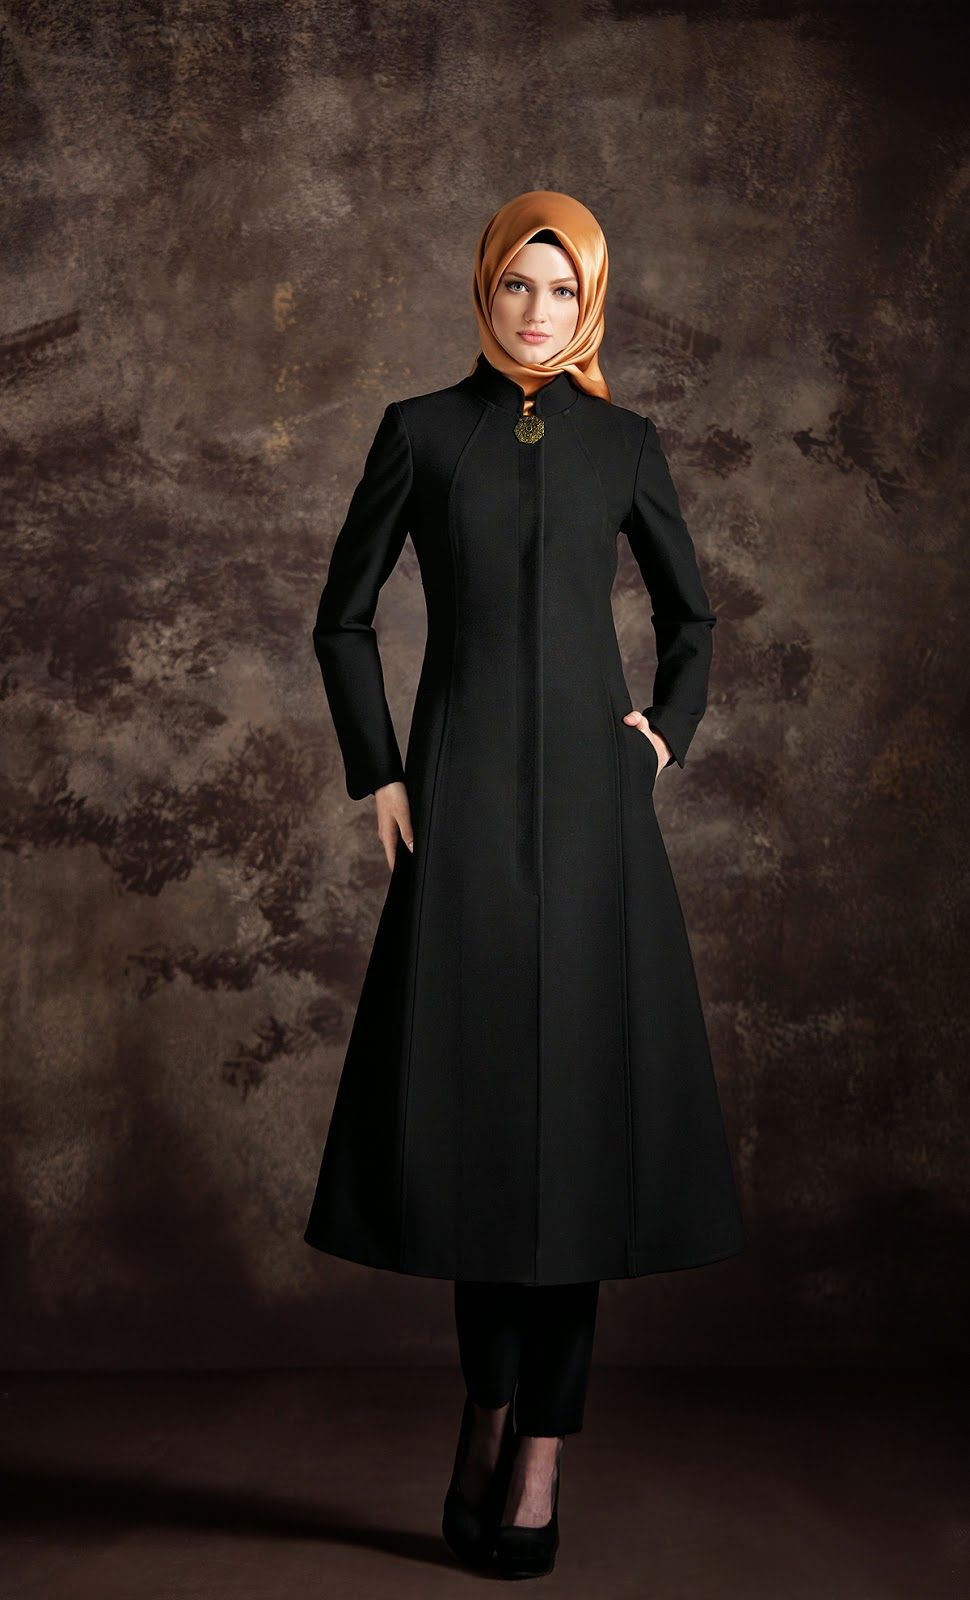 Turkish Outfit Google بحث Monto Fall Hijab 2019 En 2016 wYOxZr1Y